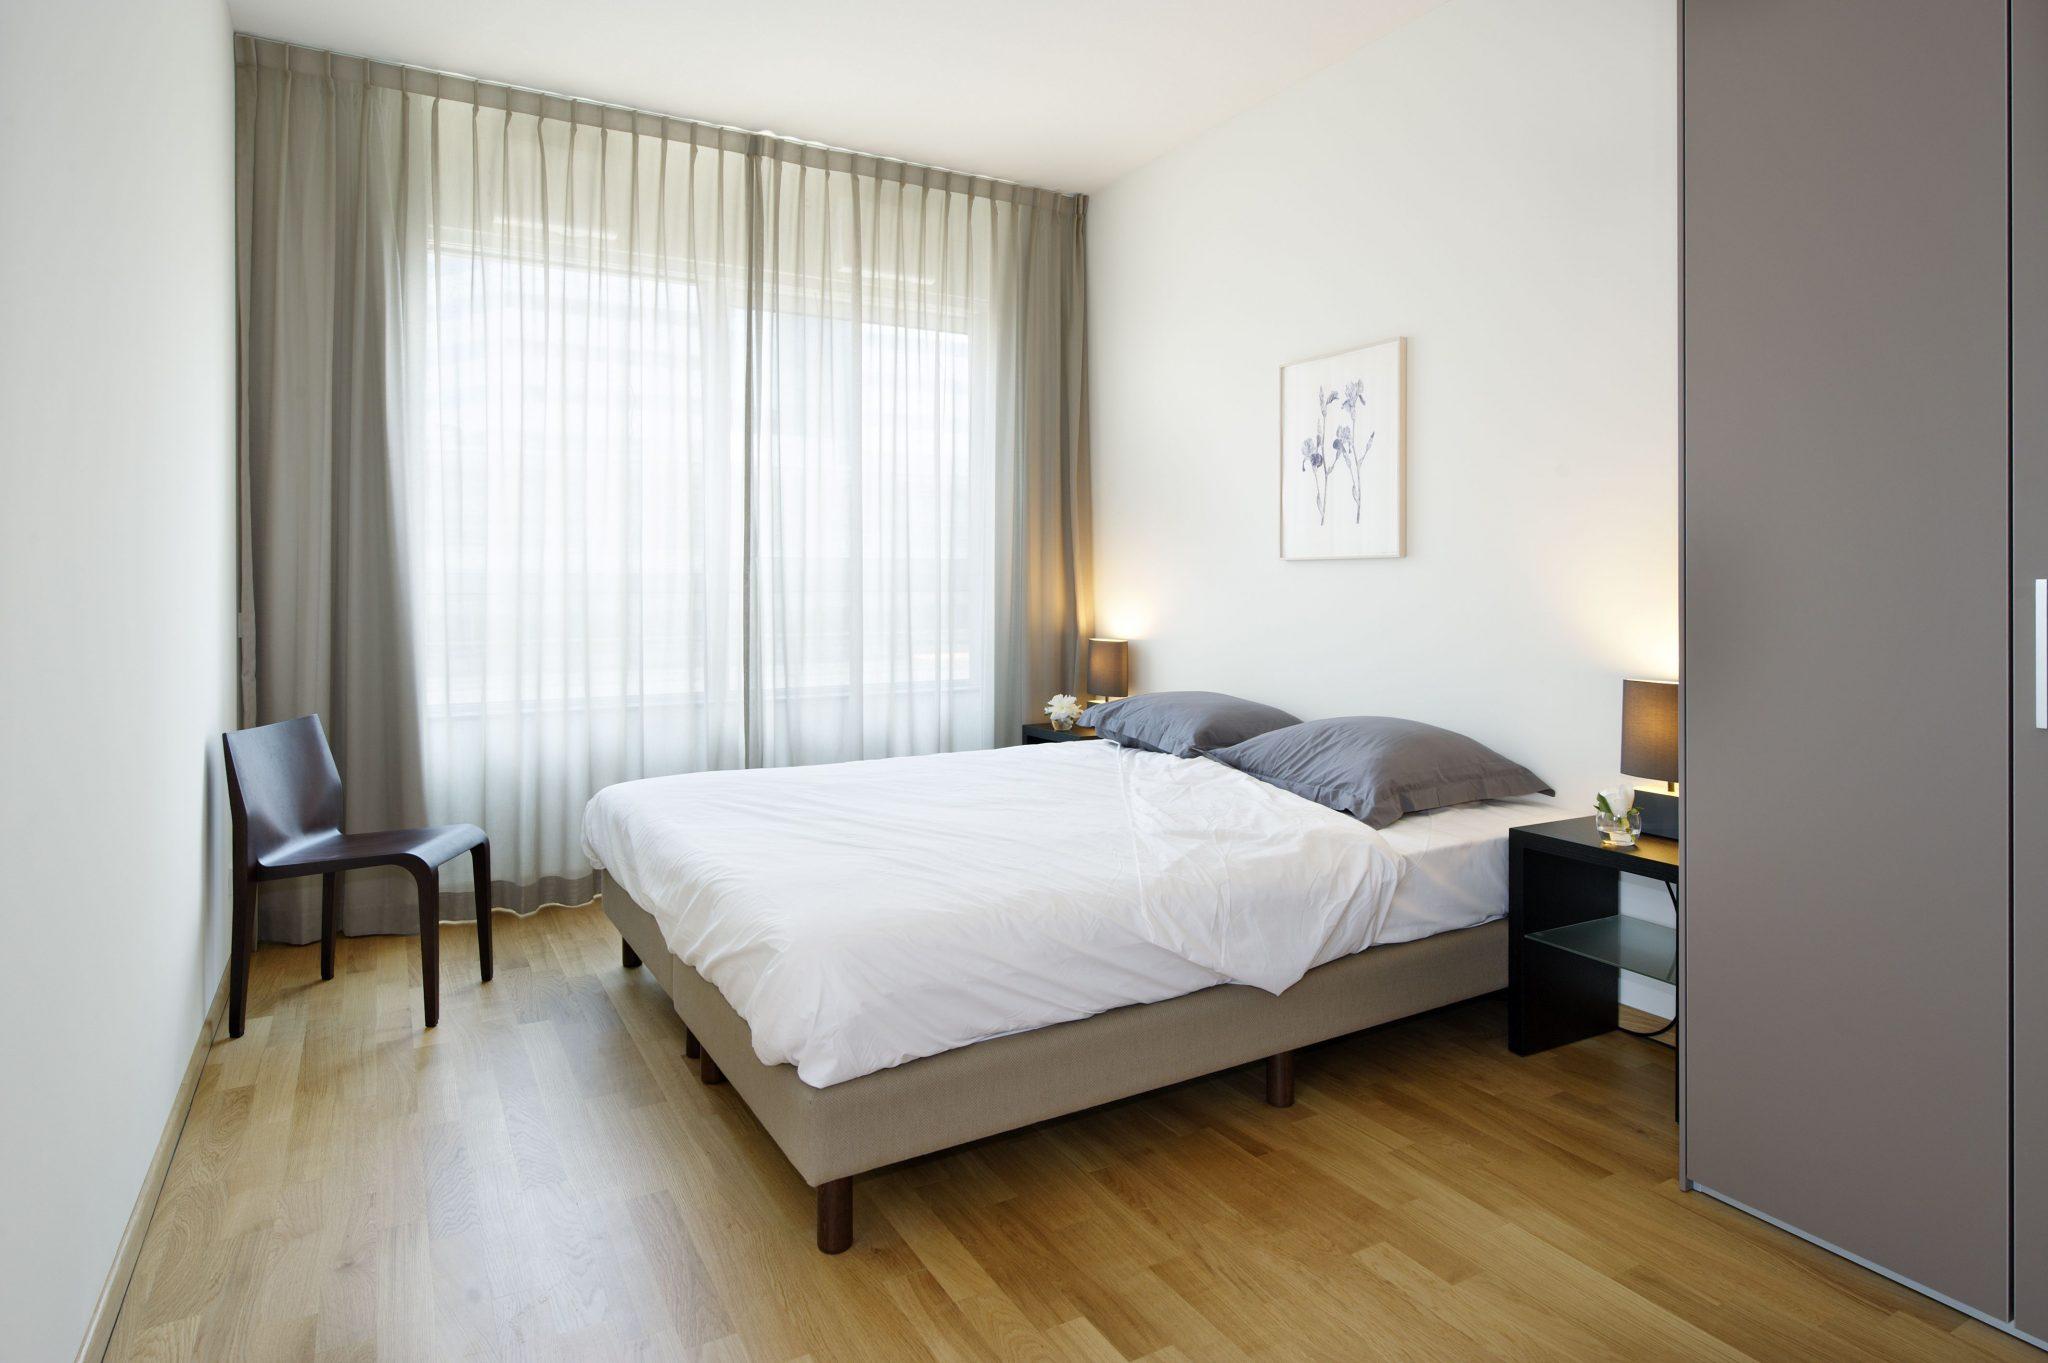 https://www.bbf.be/wp-content/uploads/2019/04/New-Amsterdam-Amsterdam-Bedroom.jpg